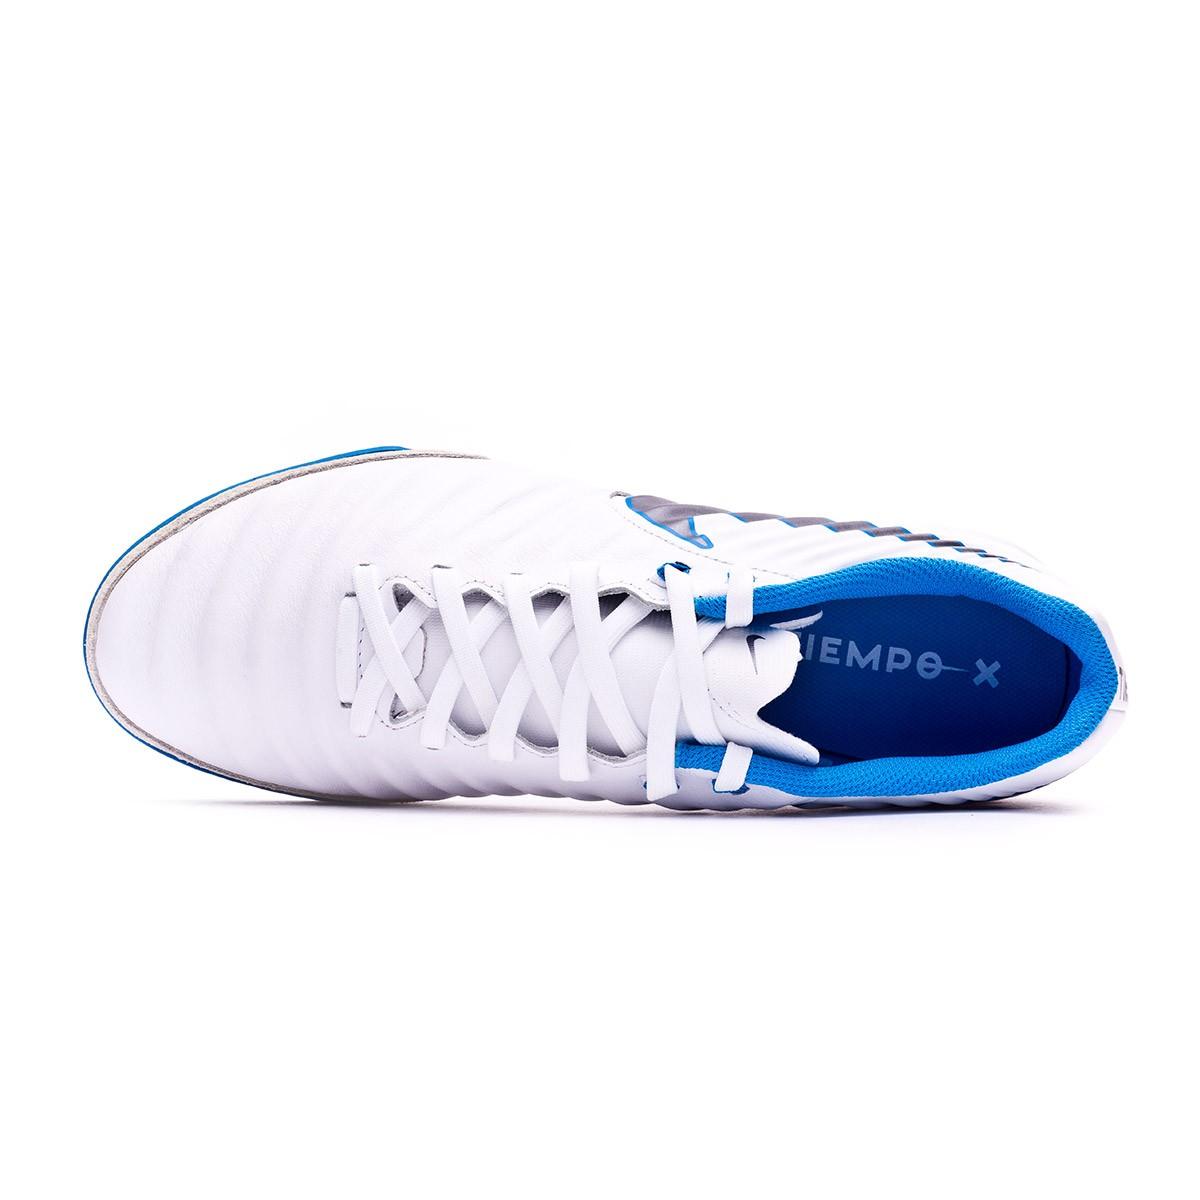 96fc2be2e68 Futsal Boot Nike Tiempo LegendX VII Academy IC White-Metallic cool grey-Blue  hero - Football store Fútbol Emotion